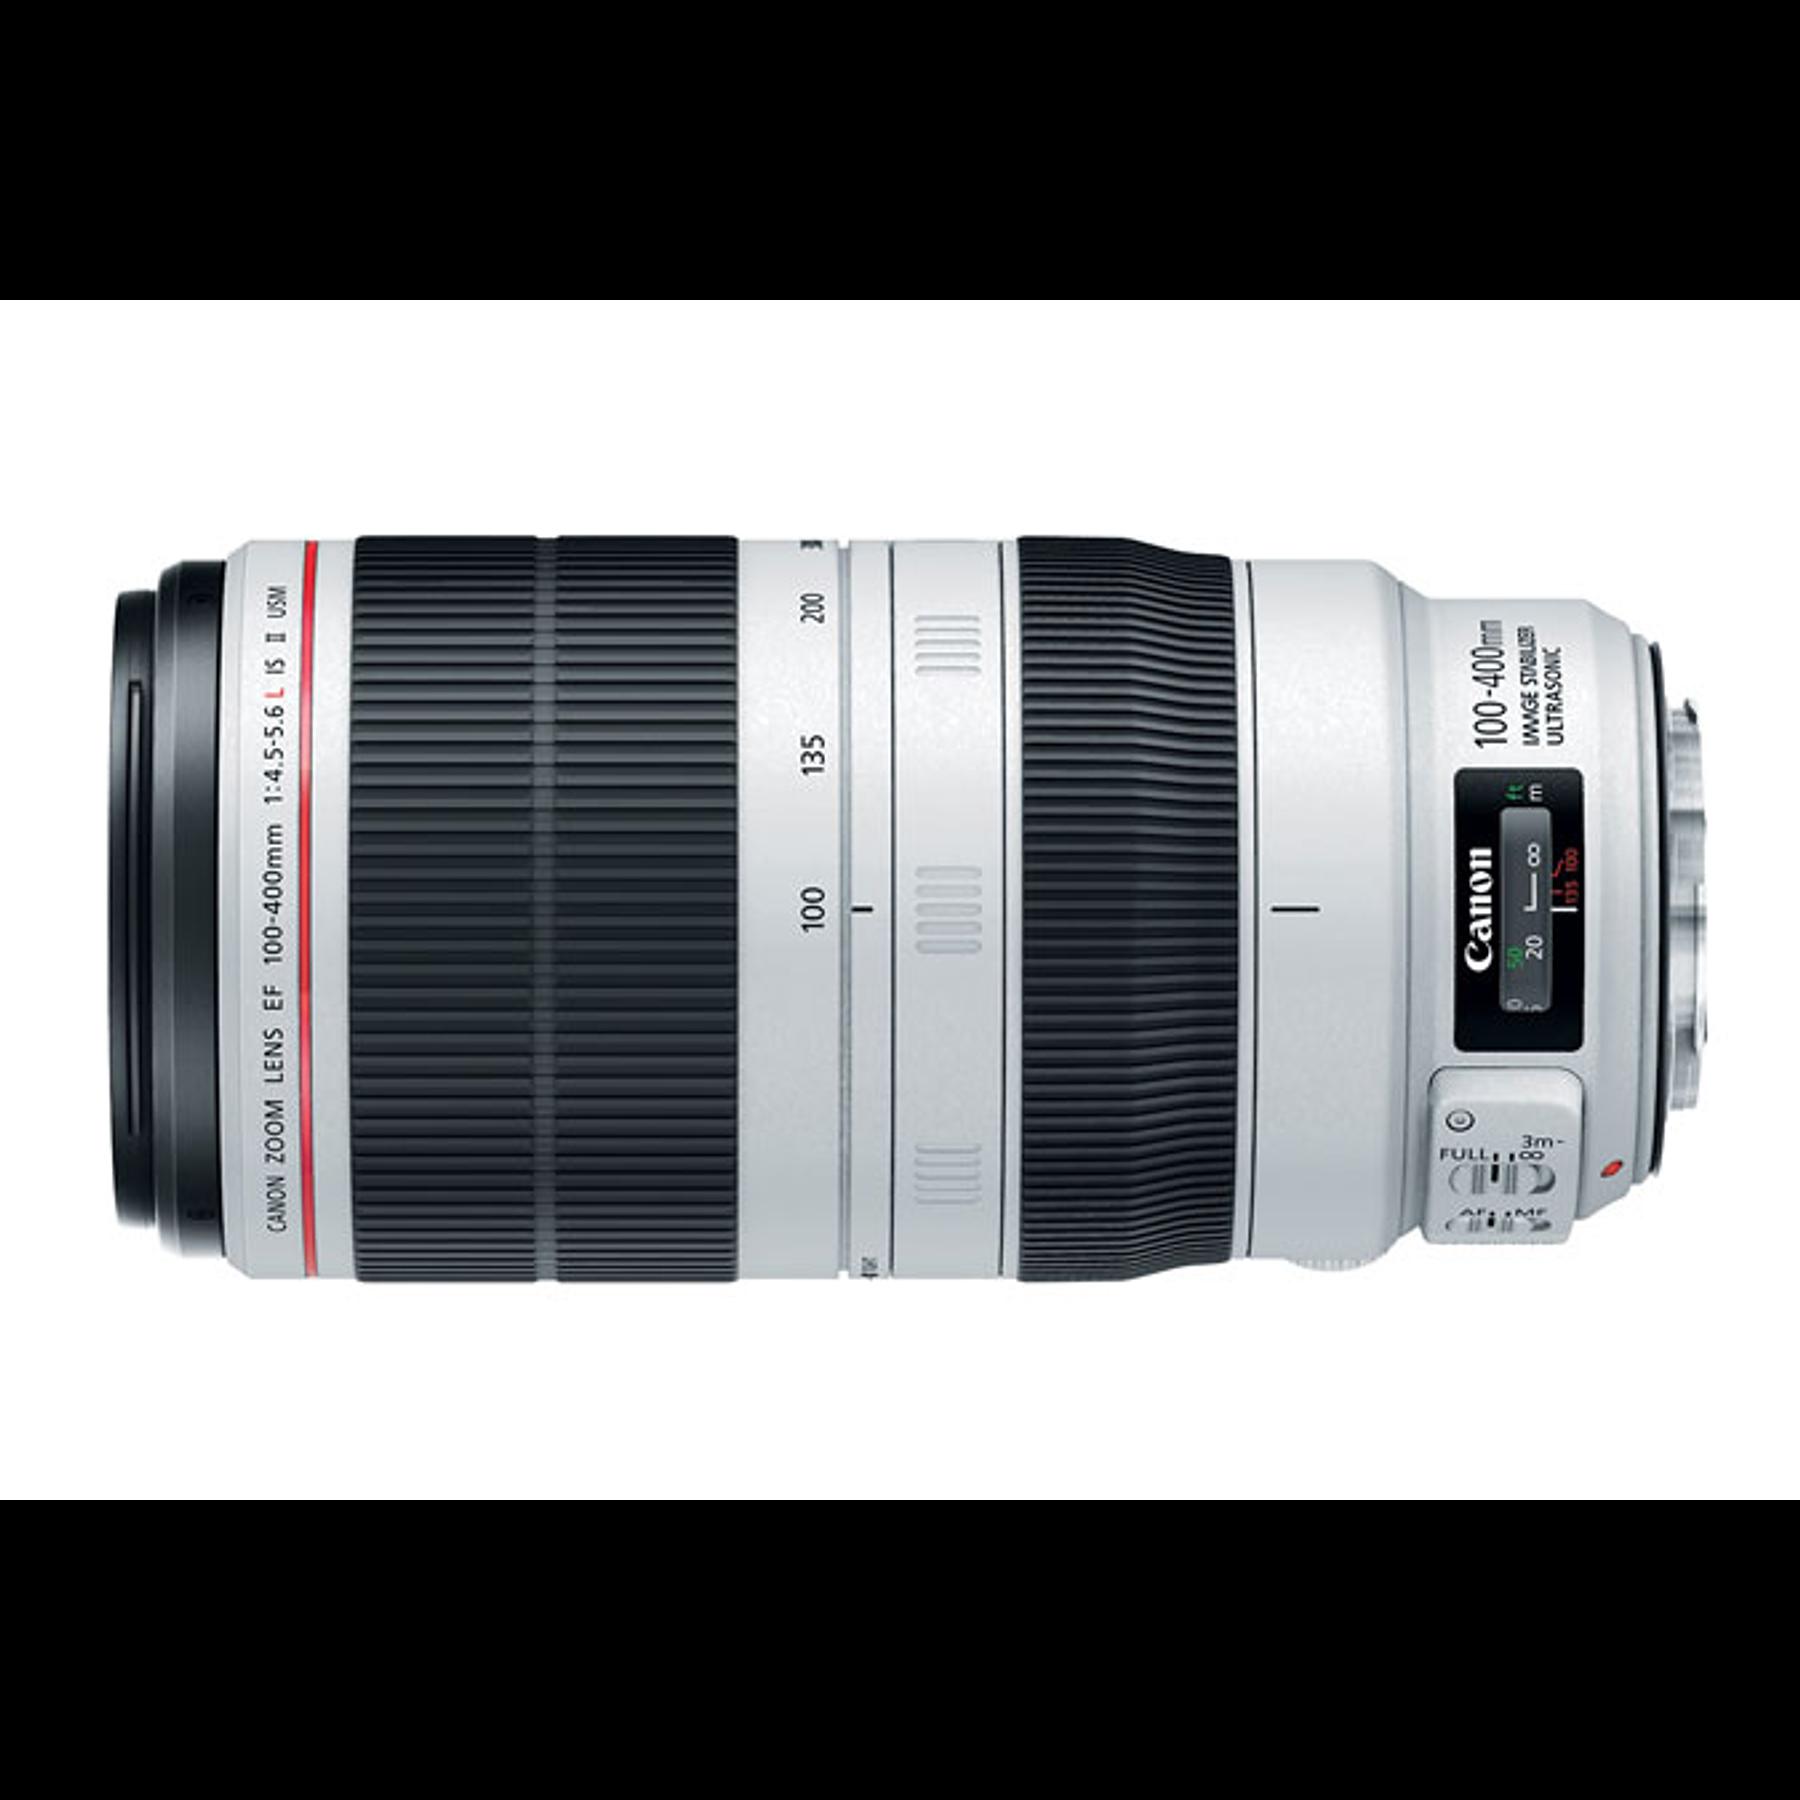 EF 100-400mm f4.5-5.6L IS II USM